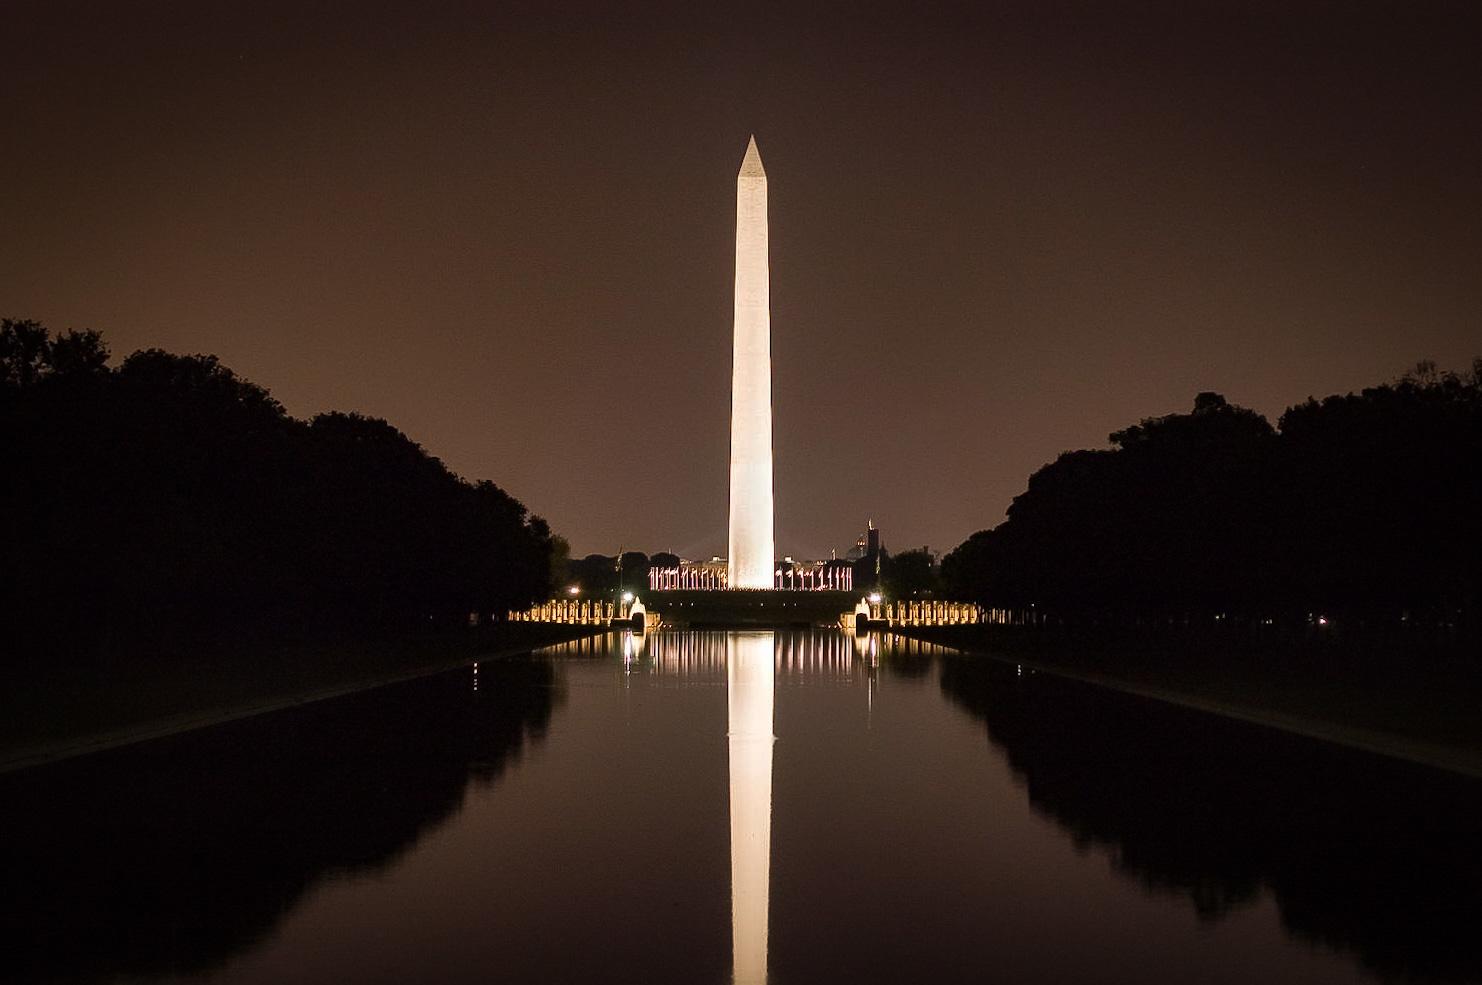 Washington Monument by David Birozy